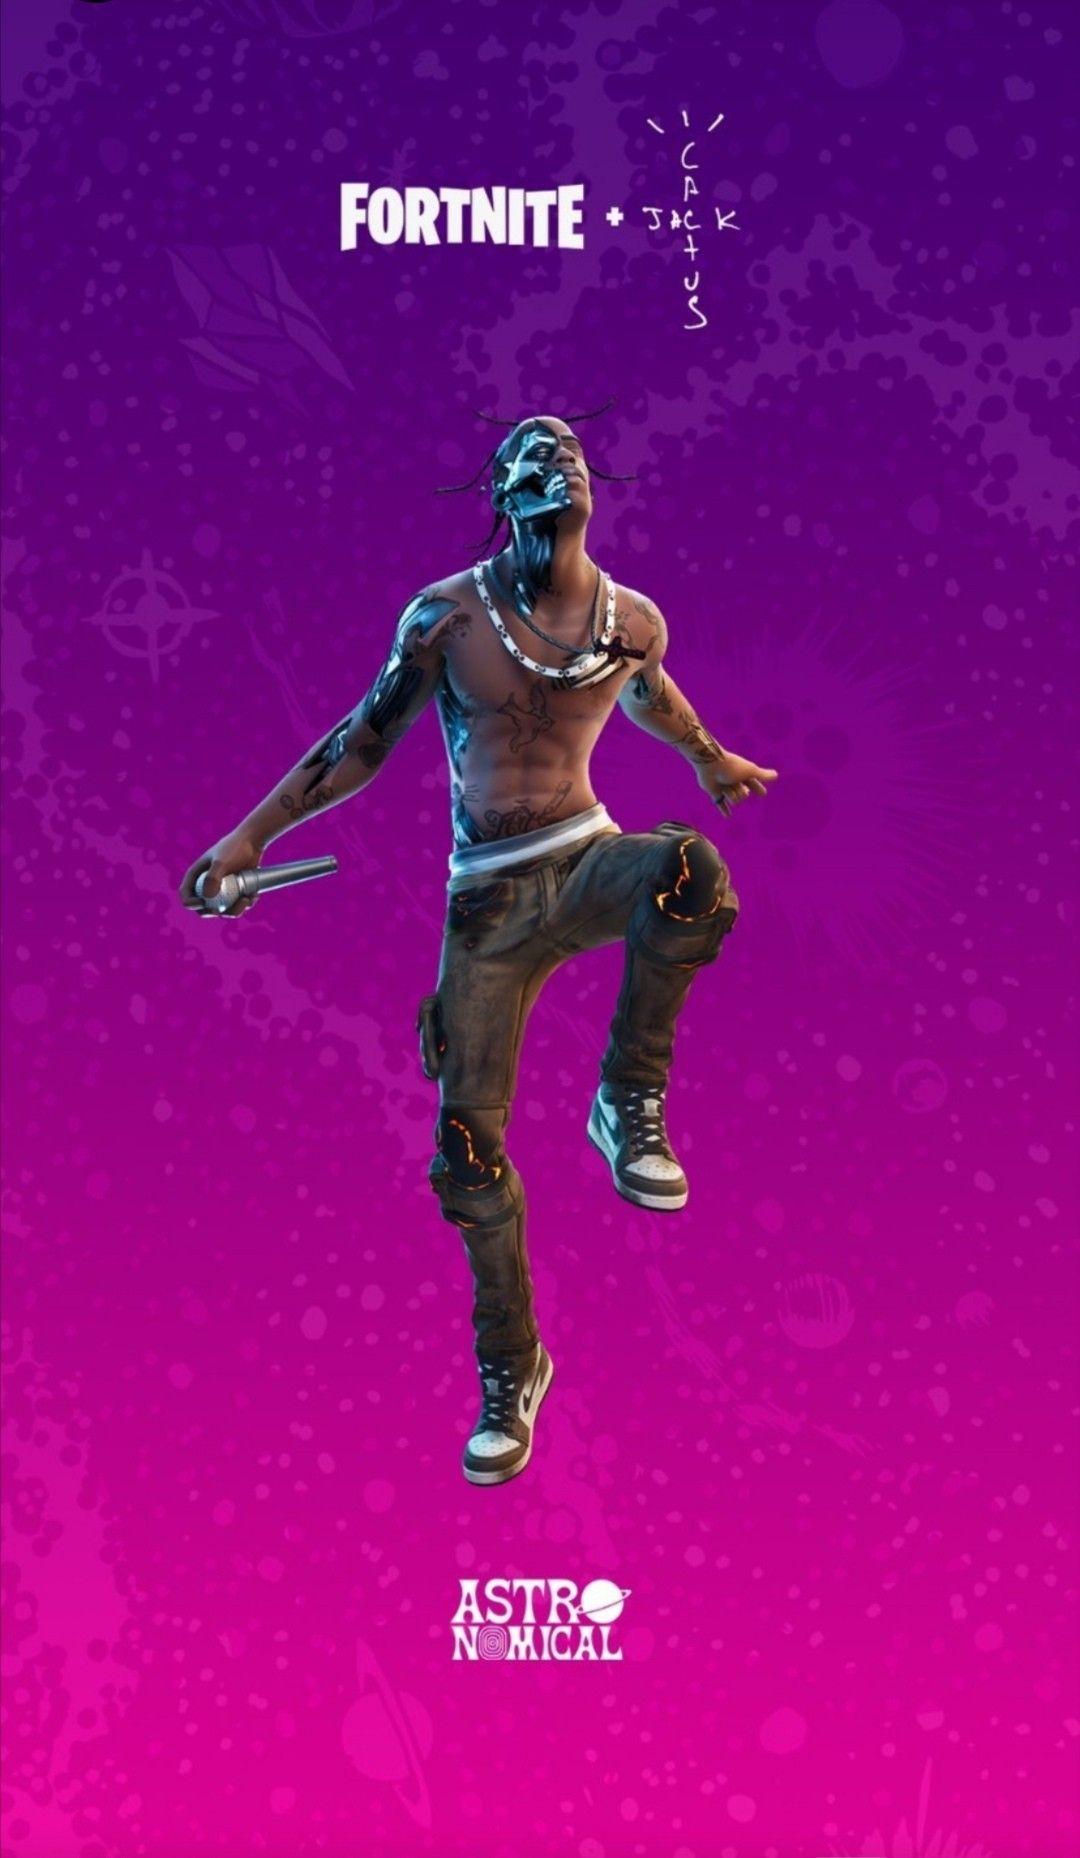 Fortnite Fortnite Season 2 Chapter 2 Skins New New Skins New Fortnite Skins In 2020 Travis Scott Wallpapers Best Gaming Wallpapers Character Wallpaper